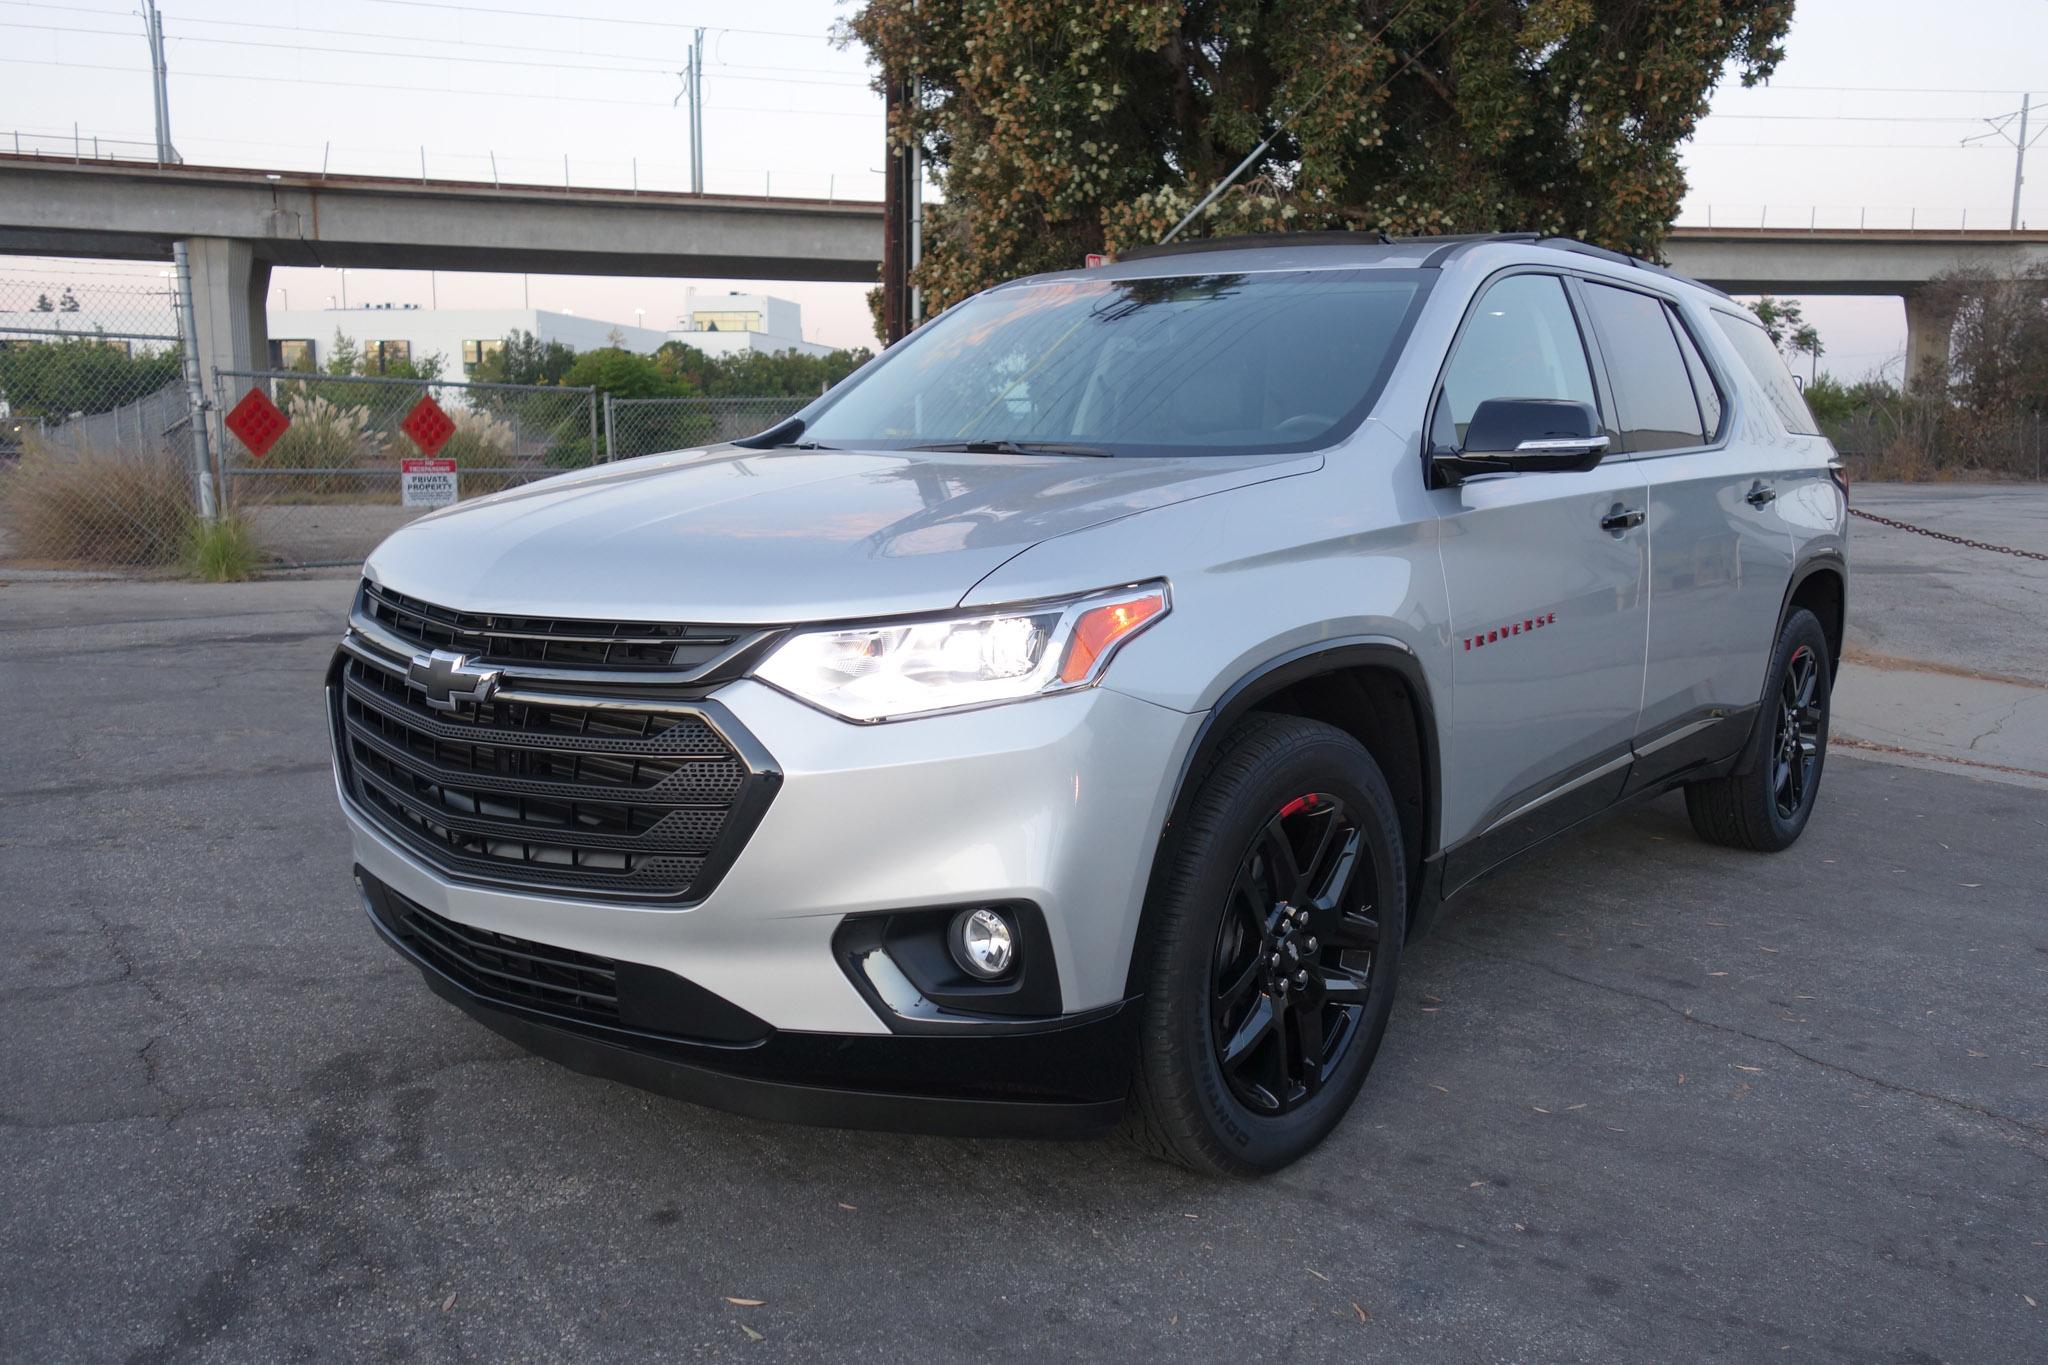 2018 Chevrolet Traverse FWD Premier Front Three Quarter